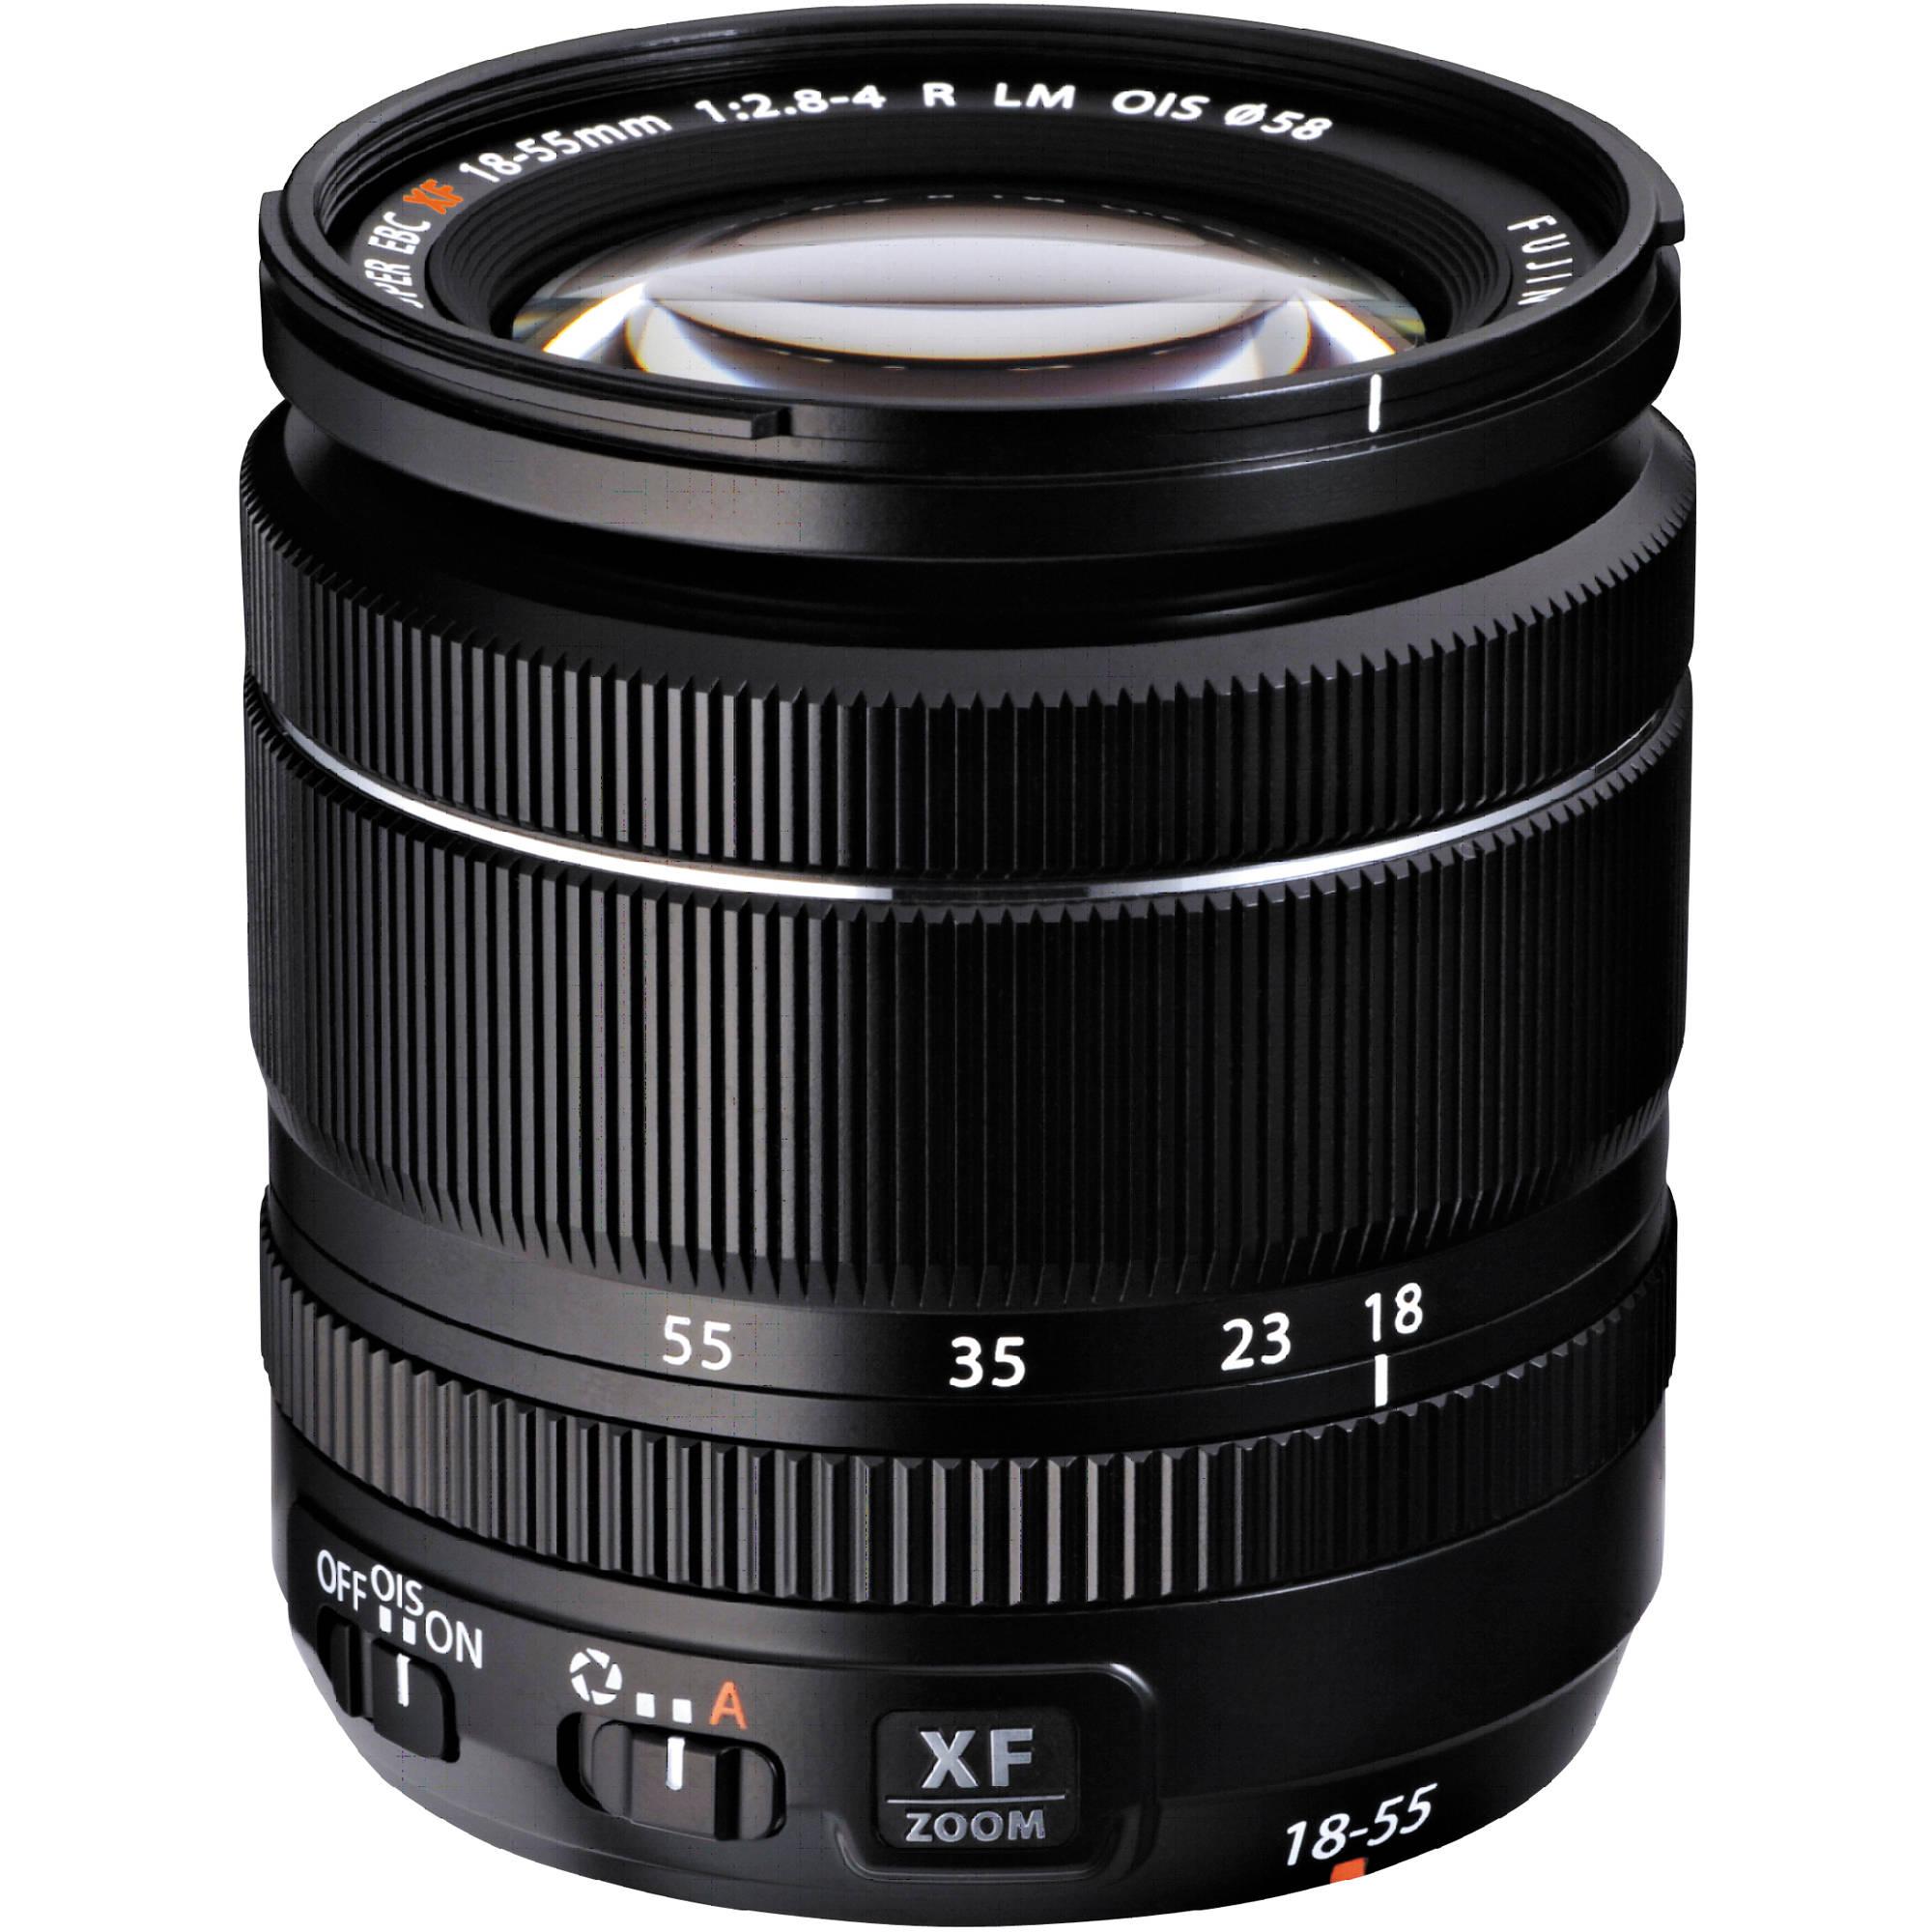 Fujifilm_XF_18_55mm_f_2_8_4_OIS_883530.jpg